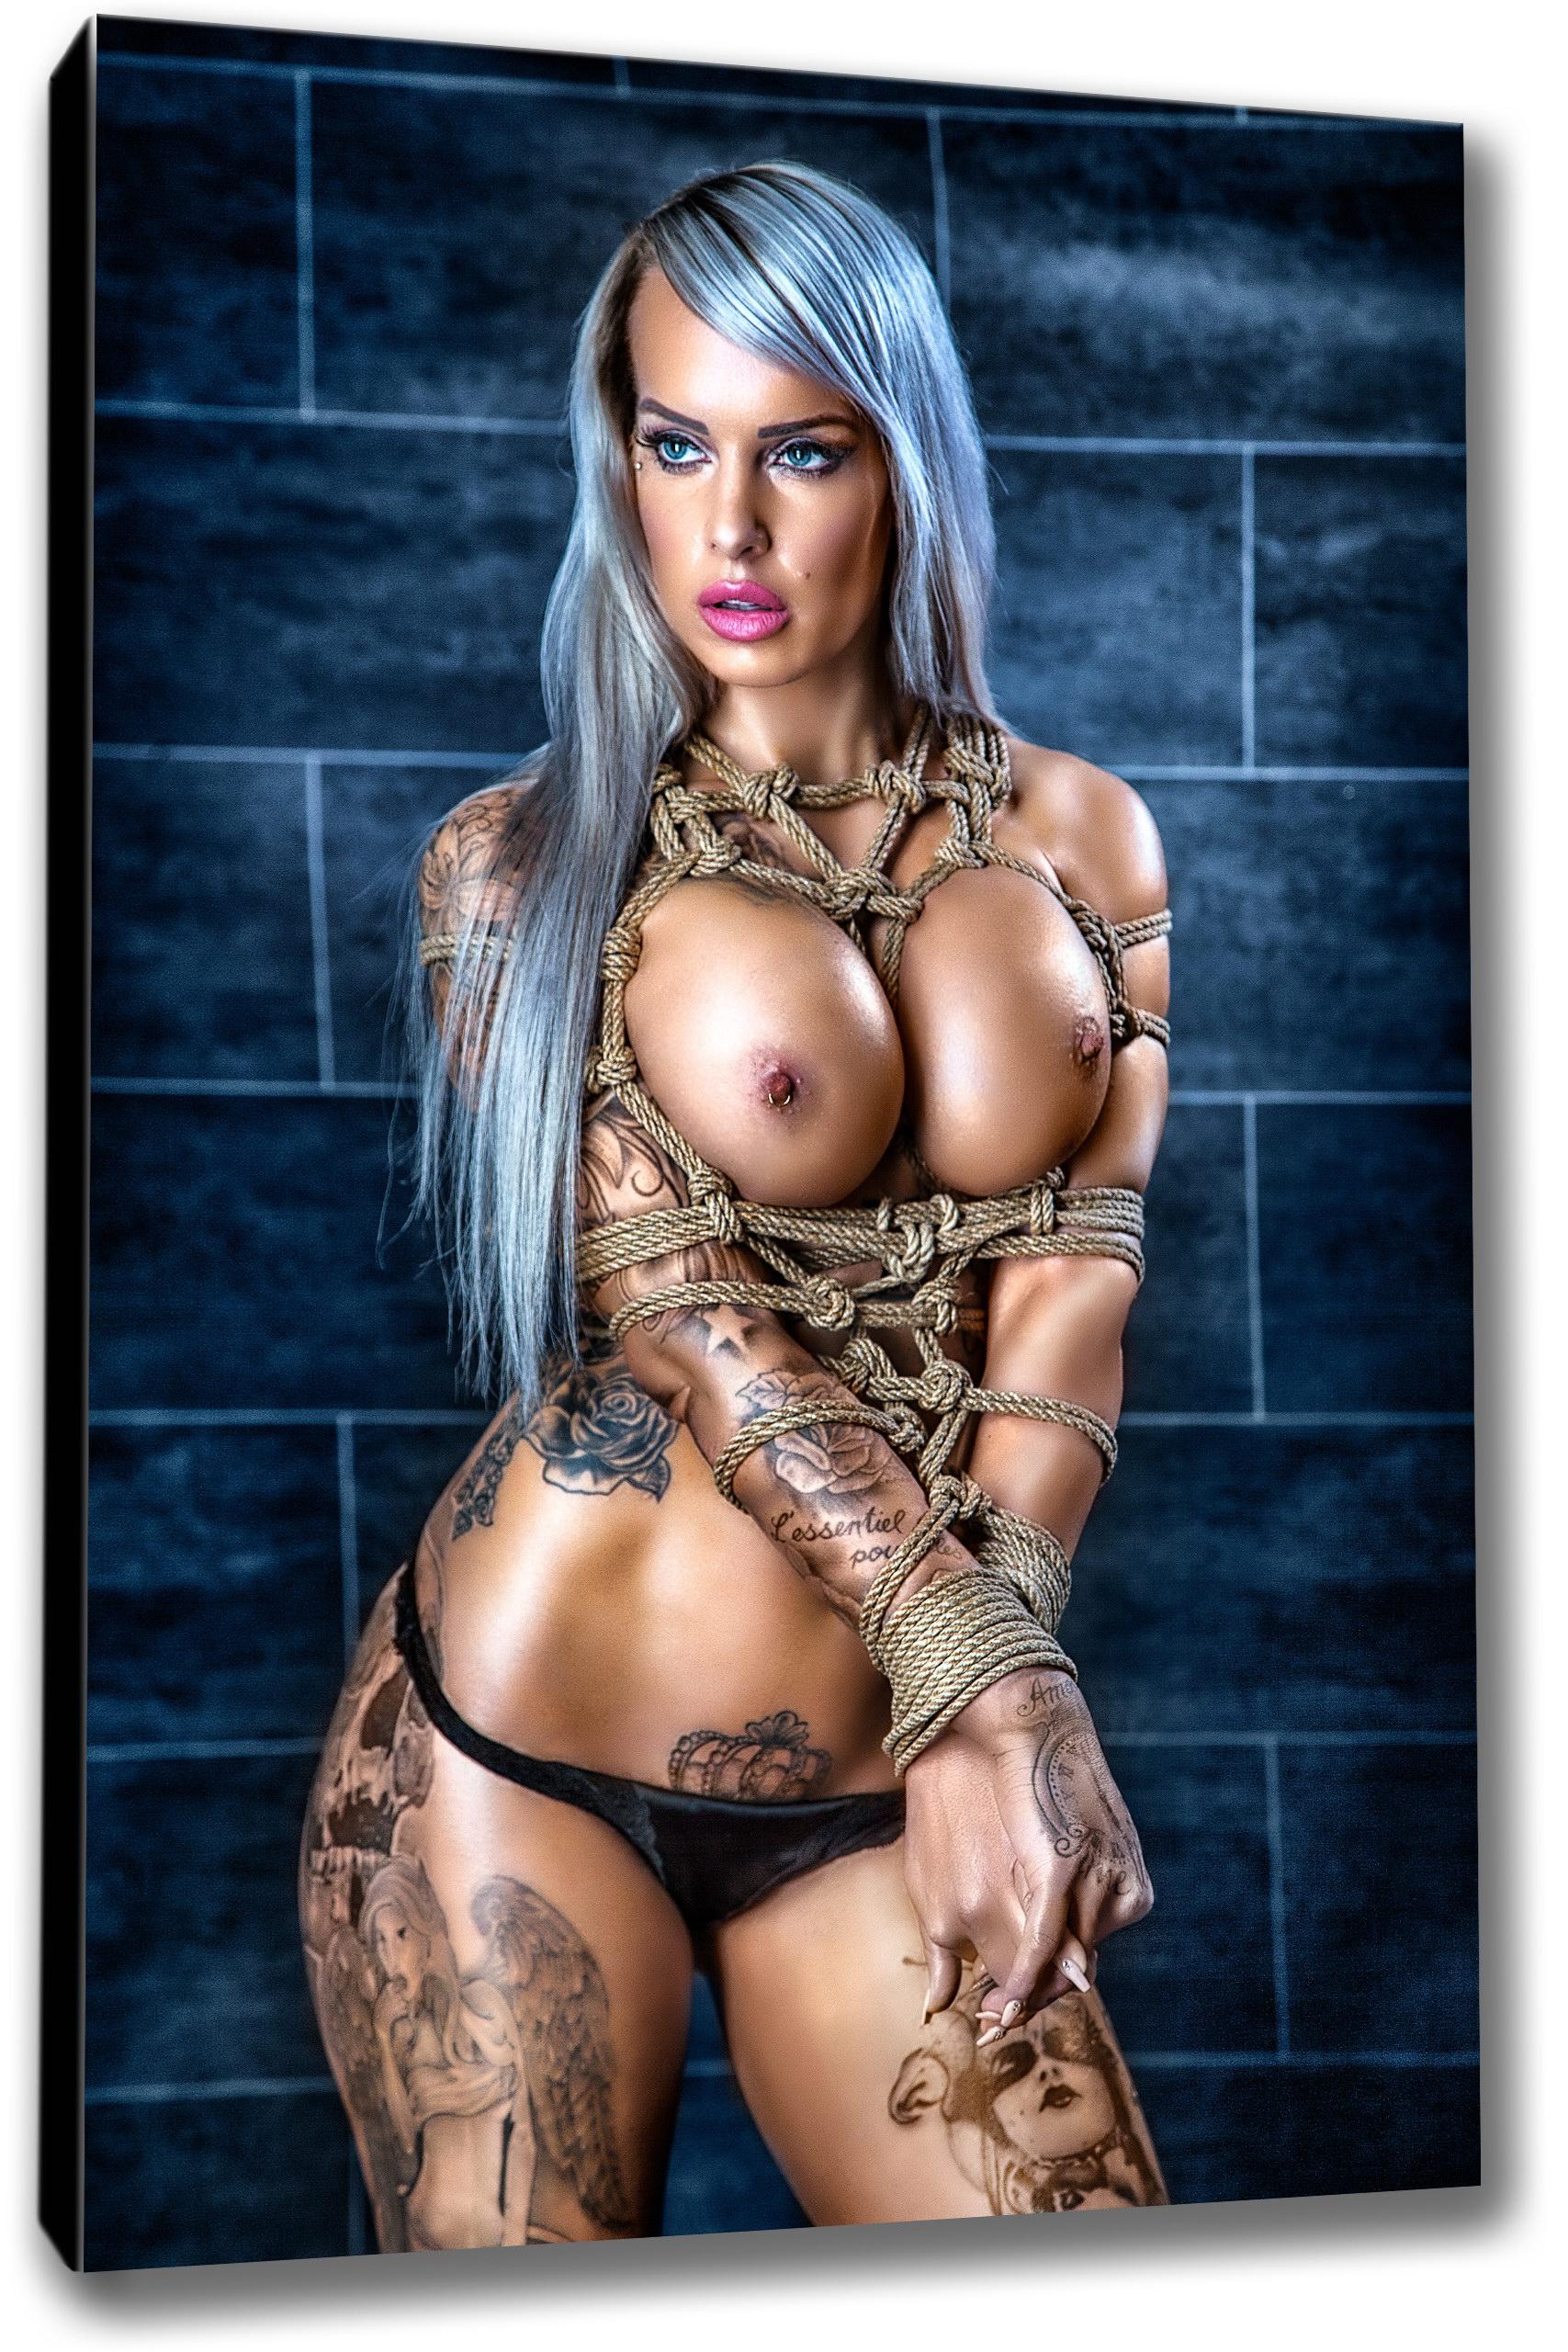 Vanessa louis nude